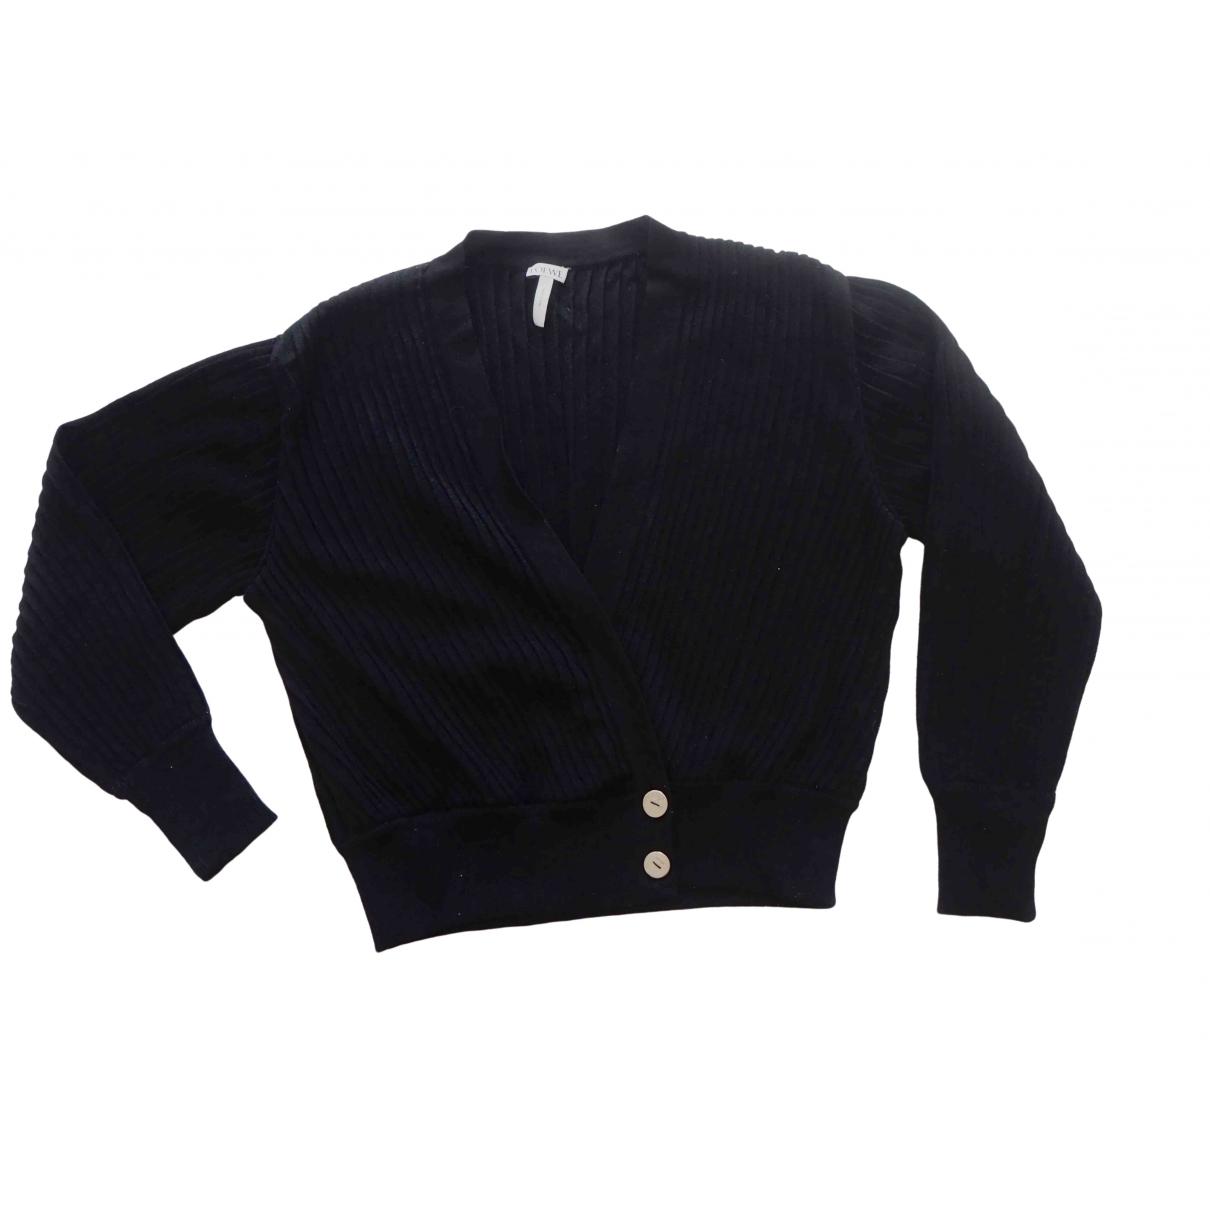 Loewe \N Black Wool Knitwear for Women S International